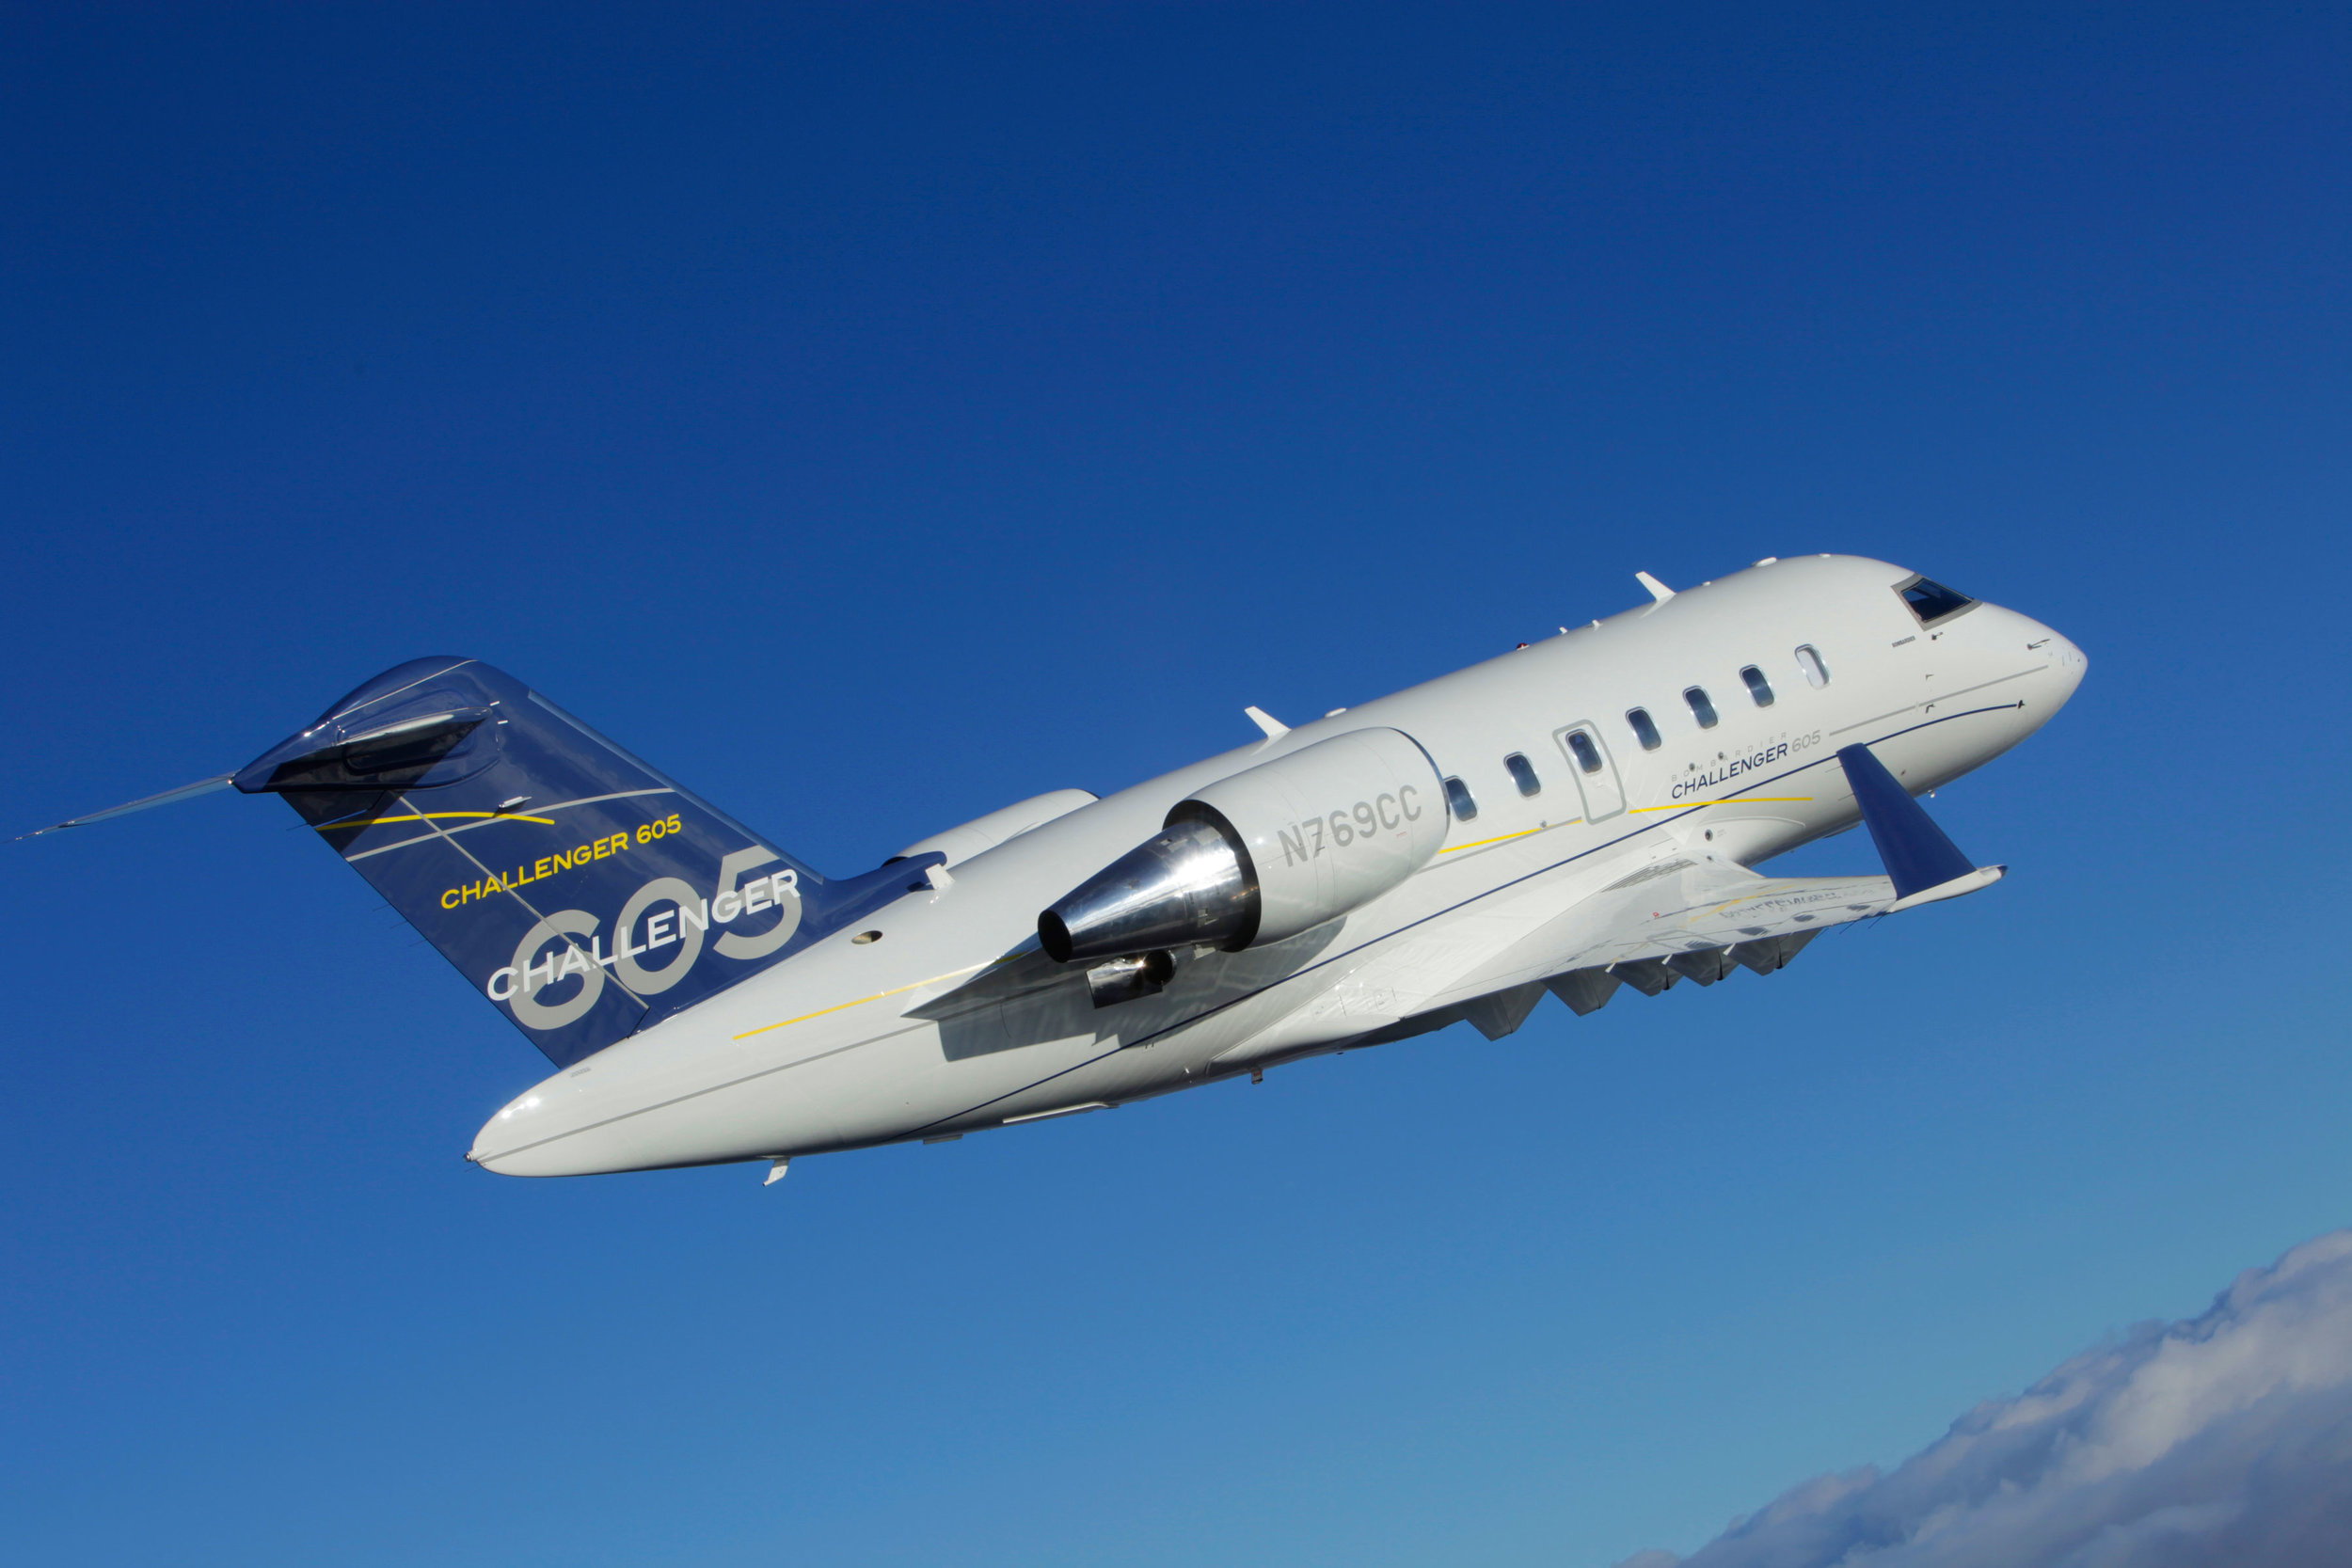 Altus Aviation Bombardier Challenger 605 Market Report - July 2017